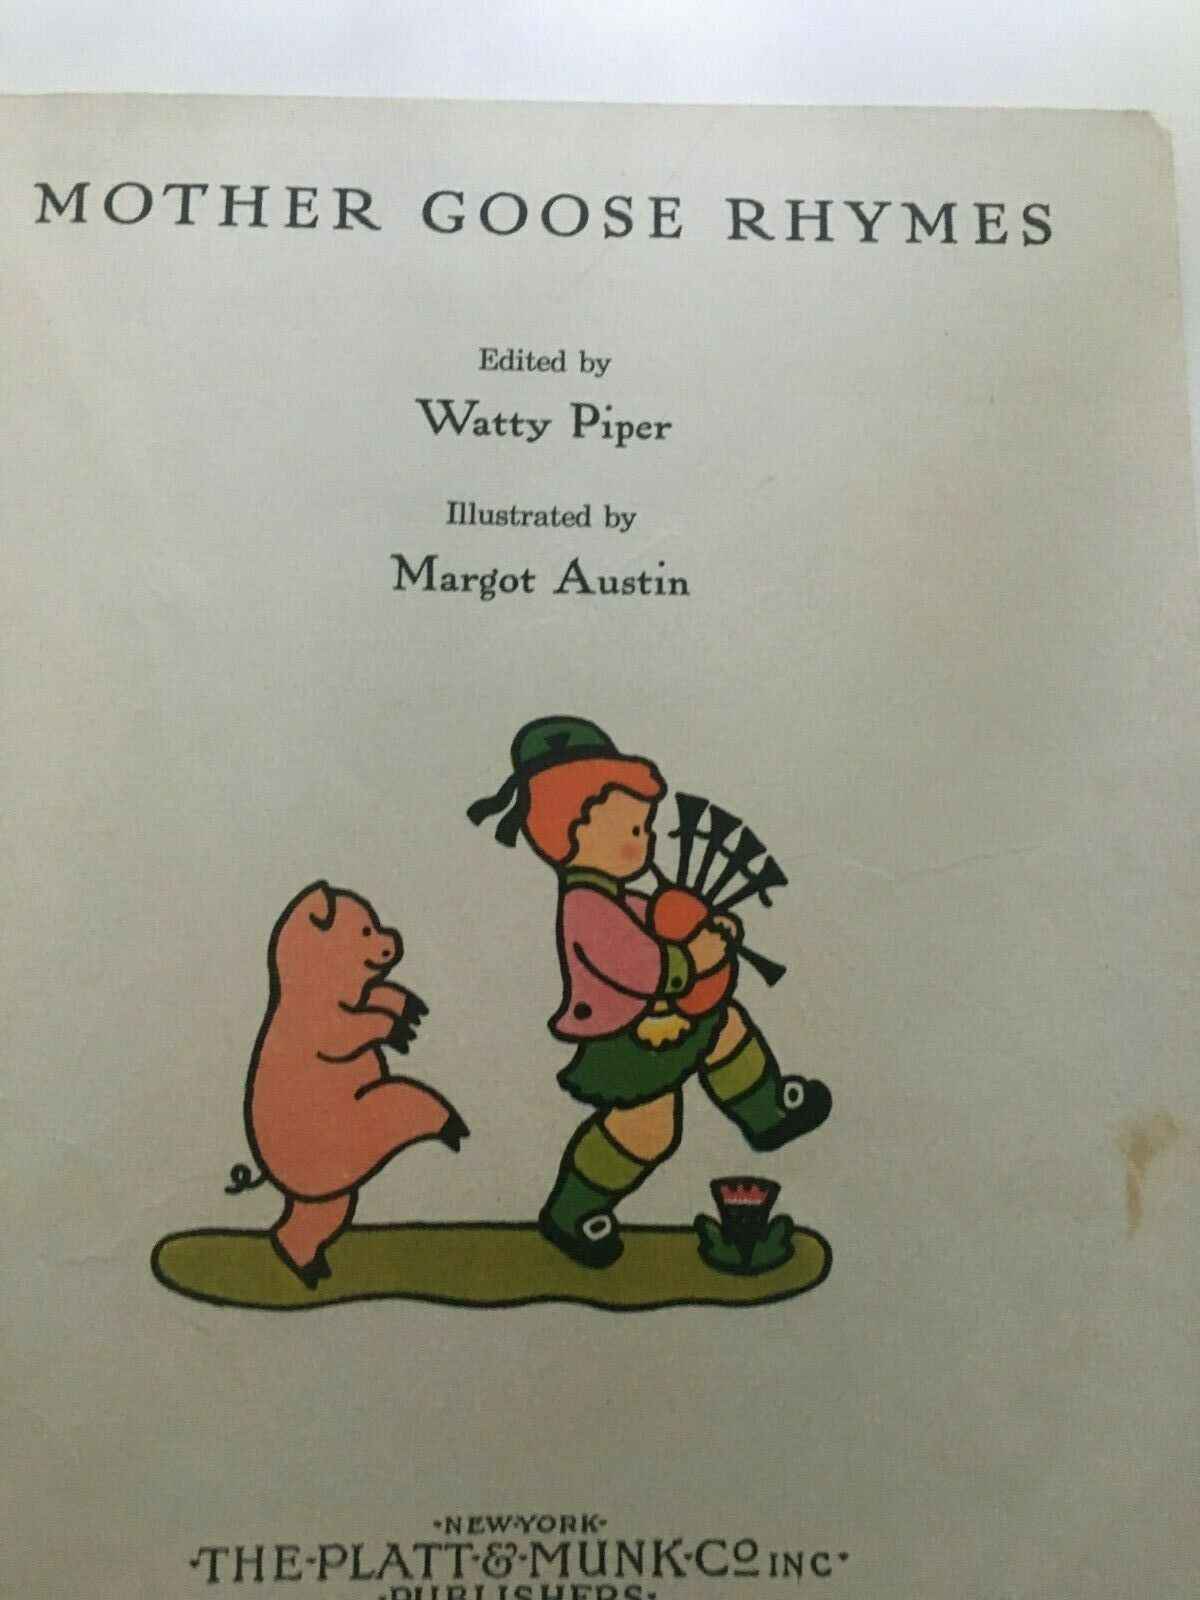 Vtg Mother Goose Rhymes Hard Cover Book Platt & Munk 1940 Margot Austin